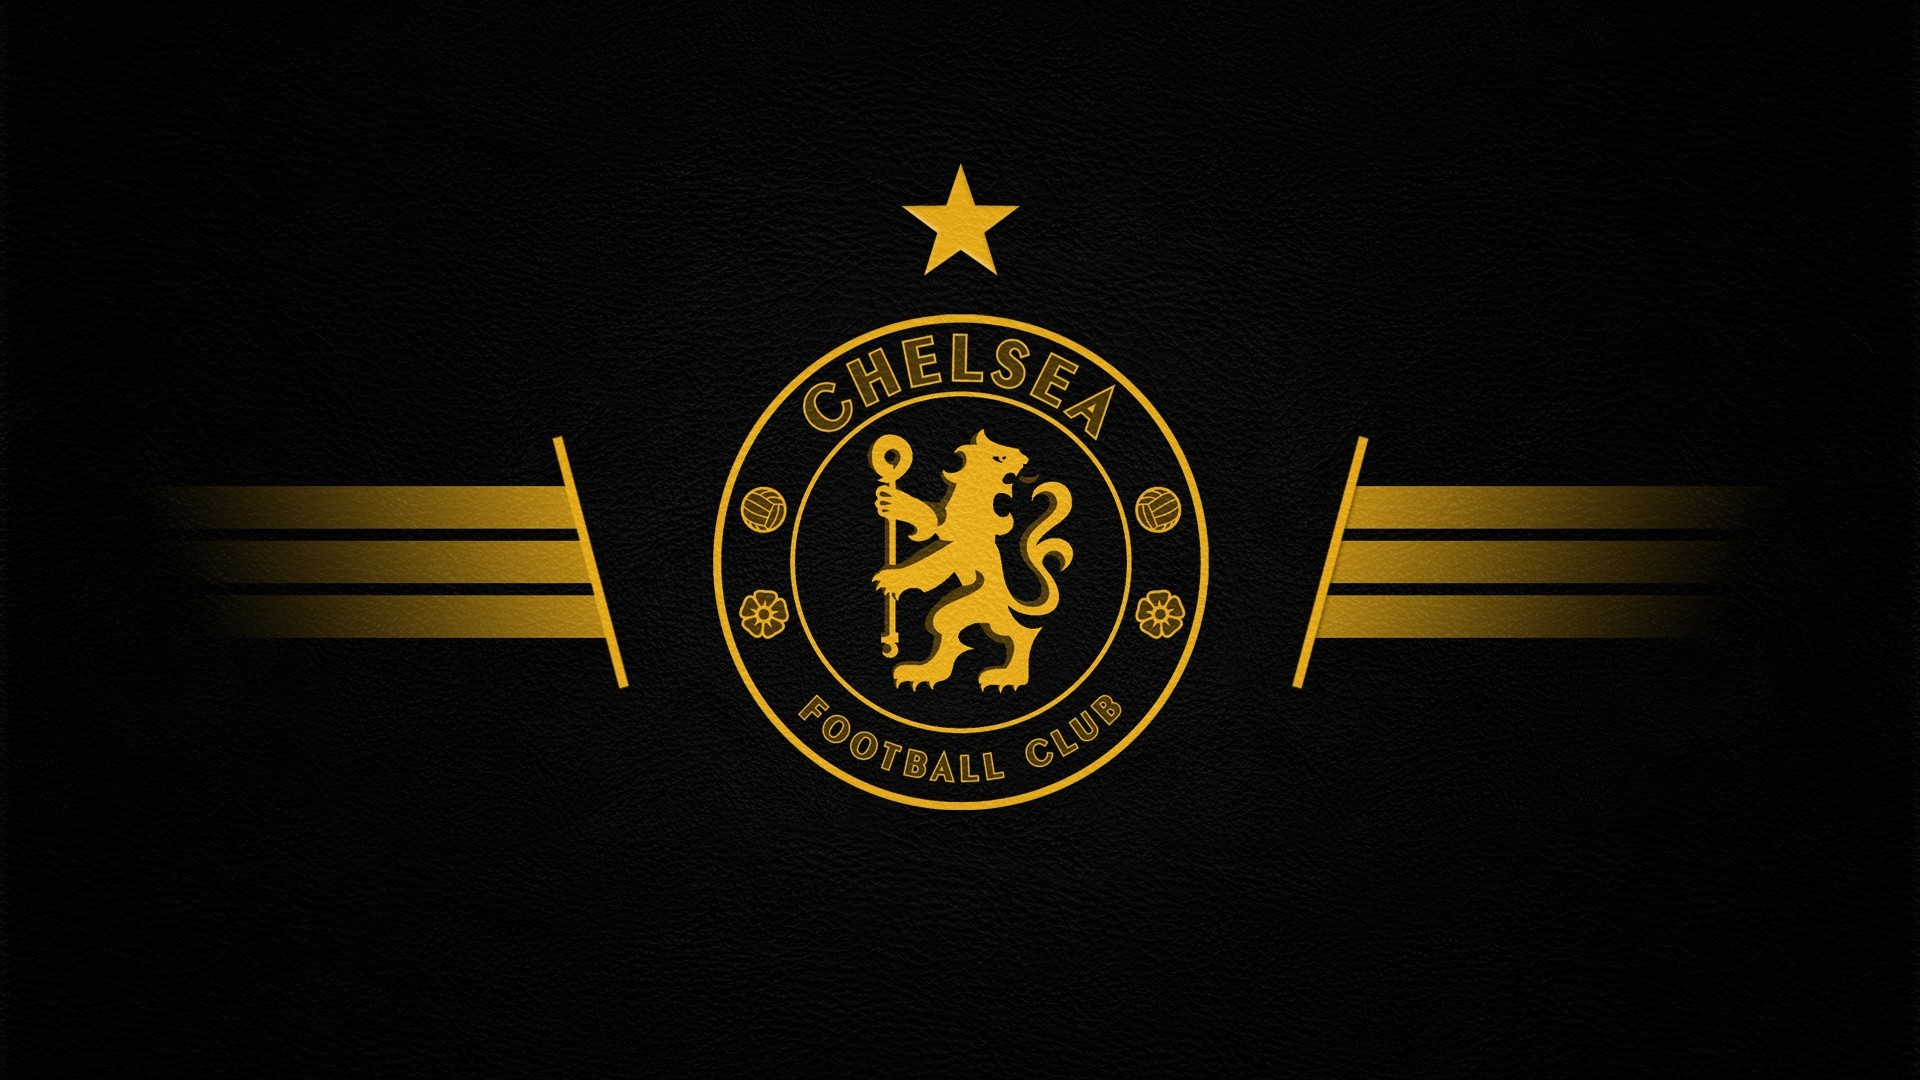 Chelsea FC Football Wallpaper 1920x1080